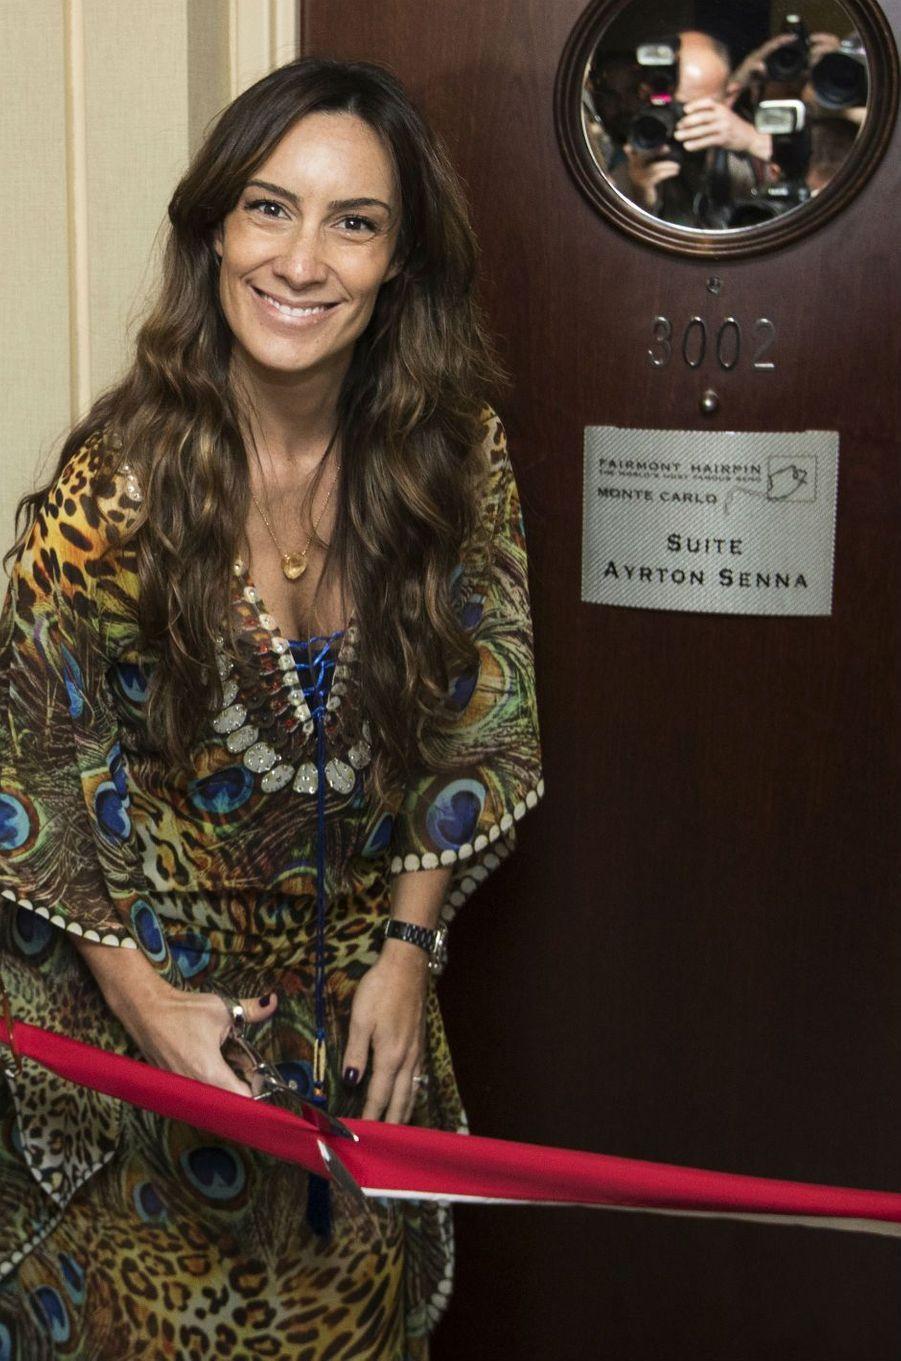 Bianca Senna, la nièce d'Ayrton Senna, inaugure la Suite Ayrton Senna au Fairmont Monte-Carlo.